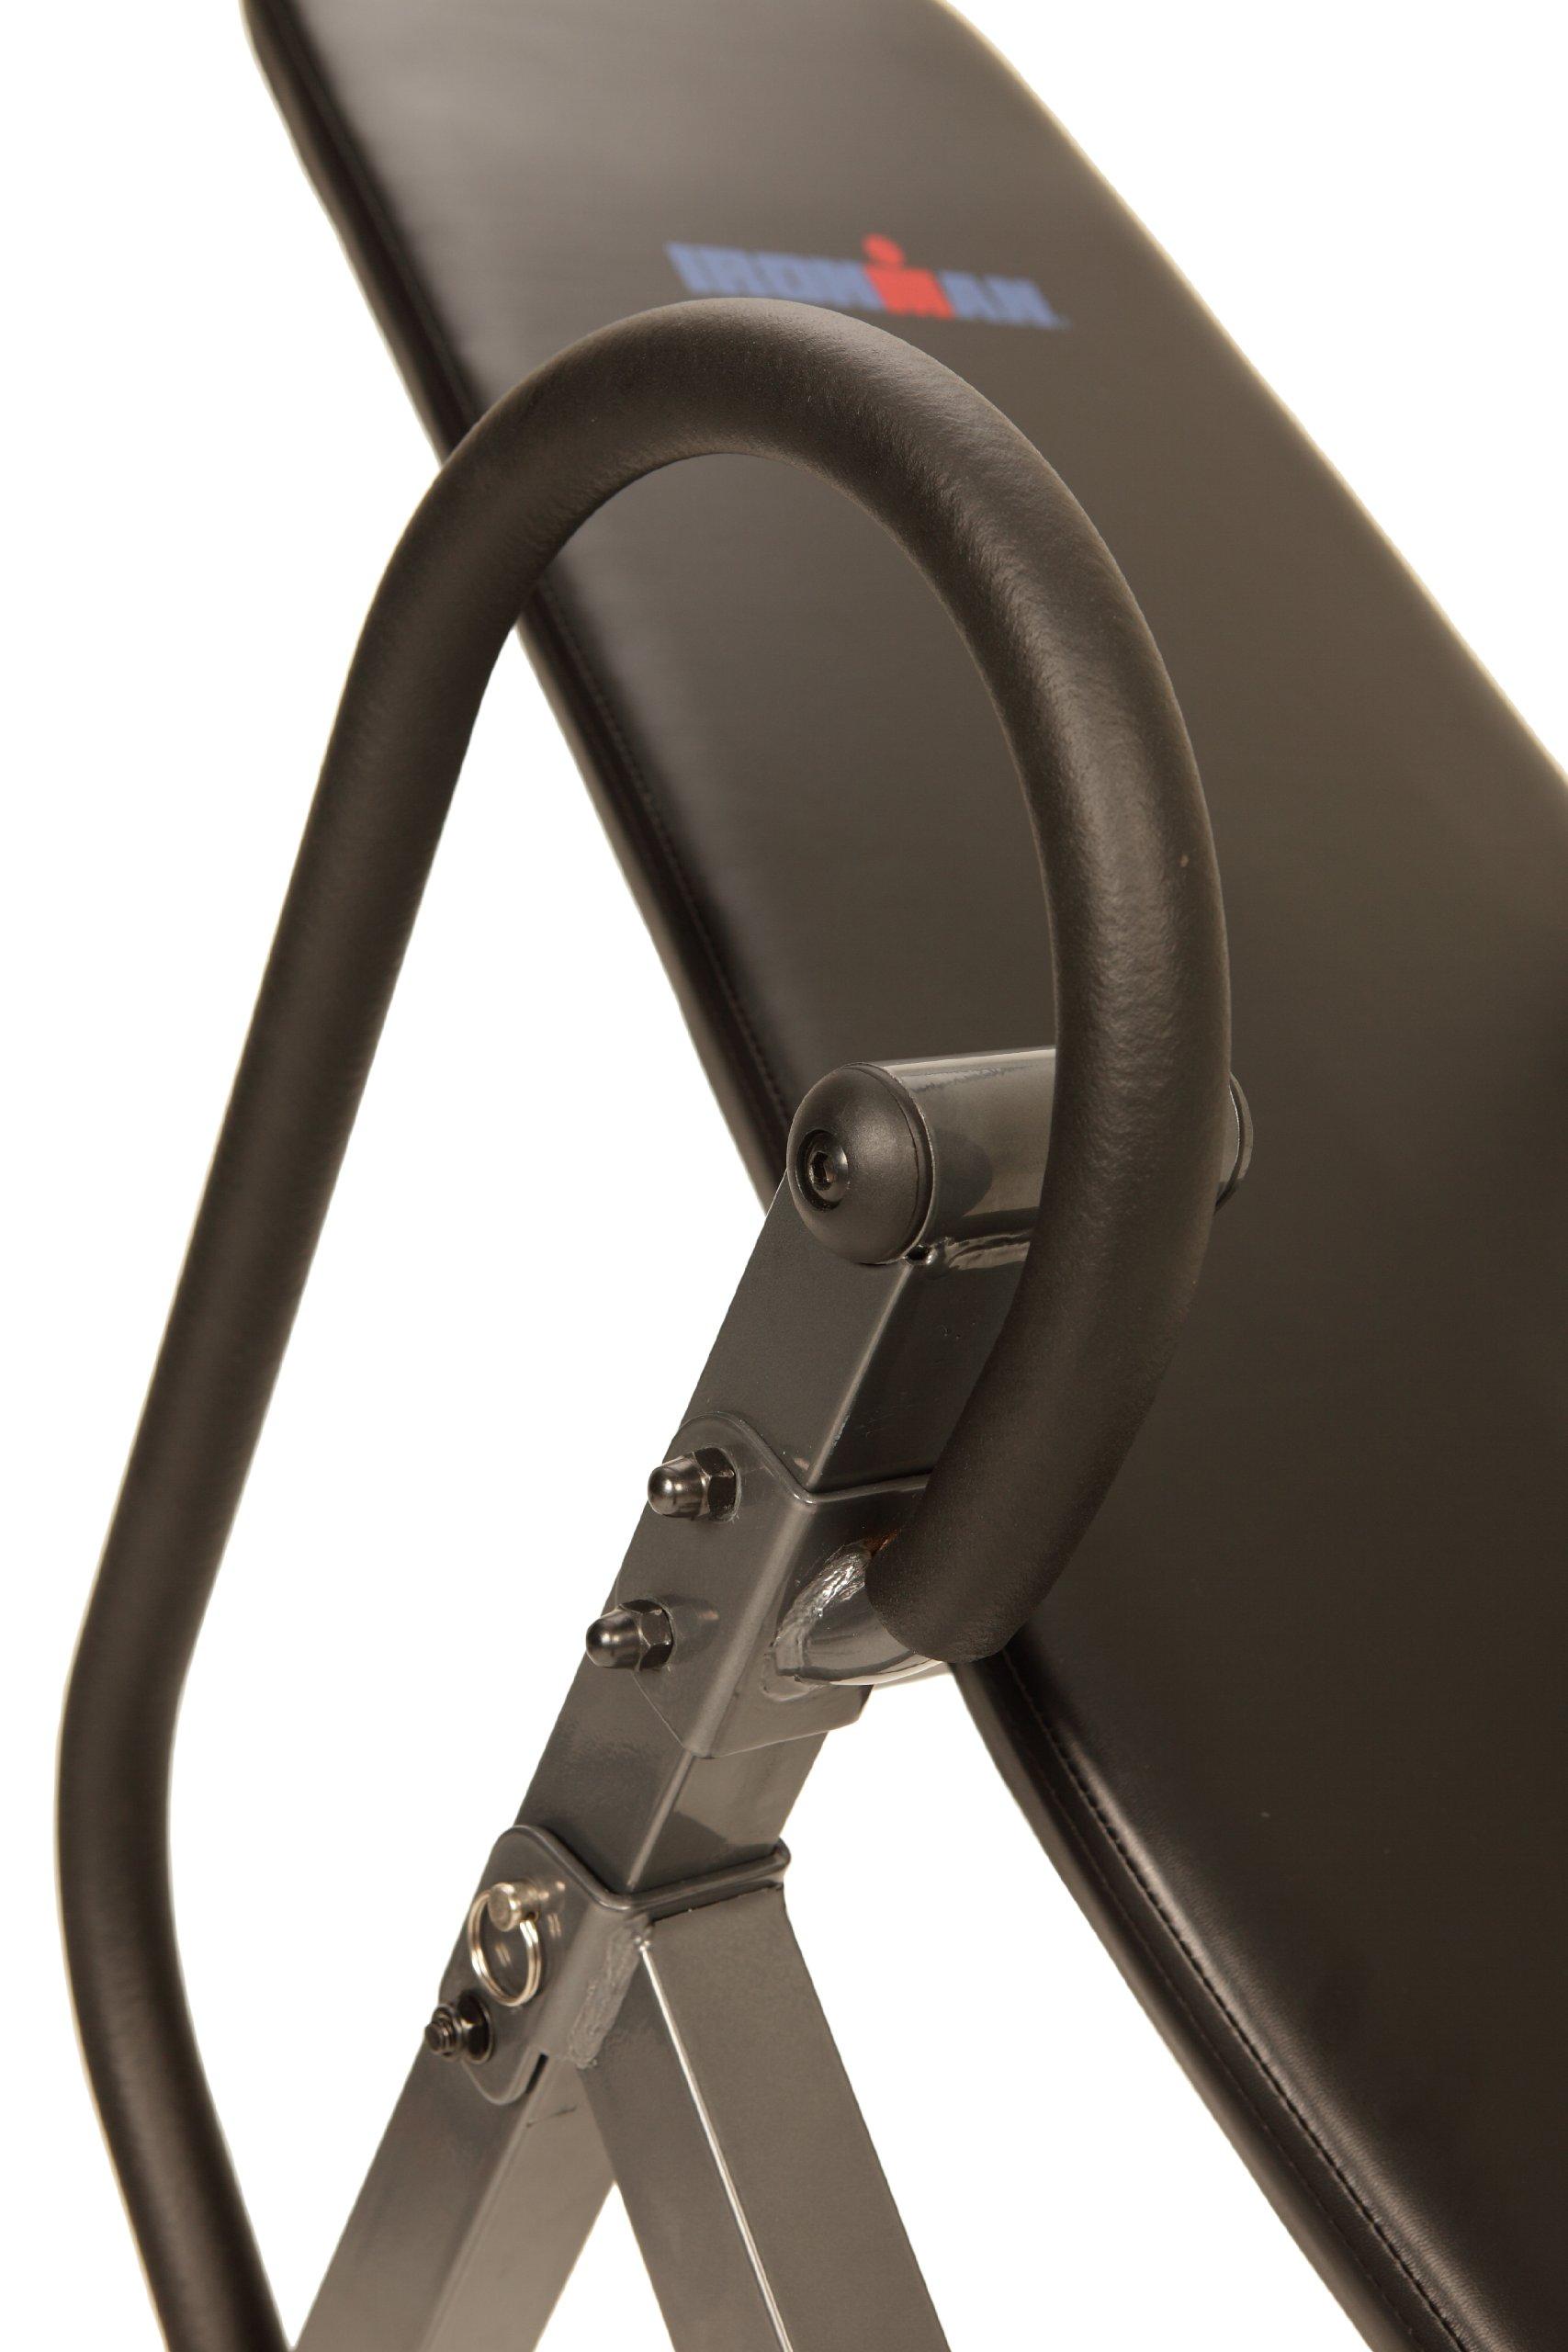 Ironman Lx300 Inversion Table Smart Monkey Fitness